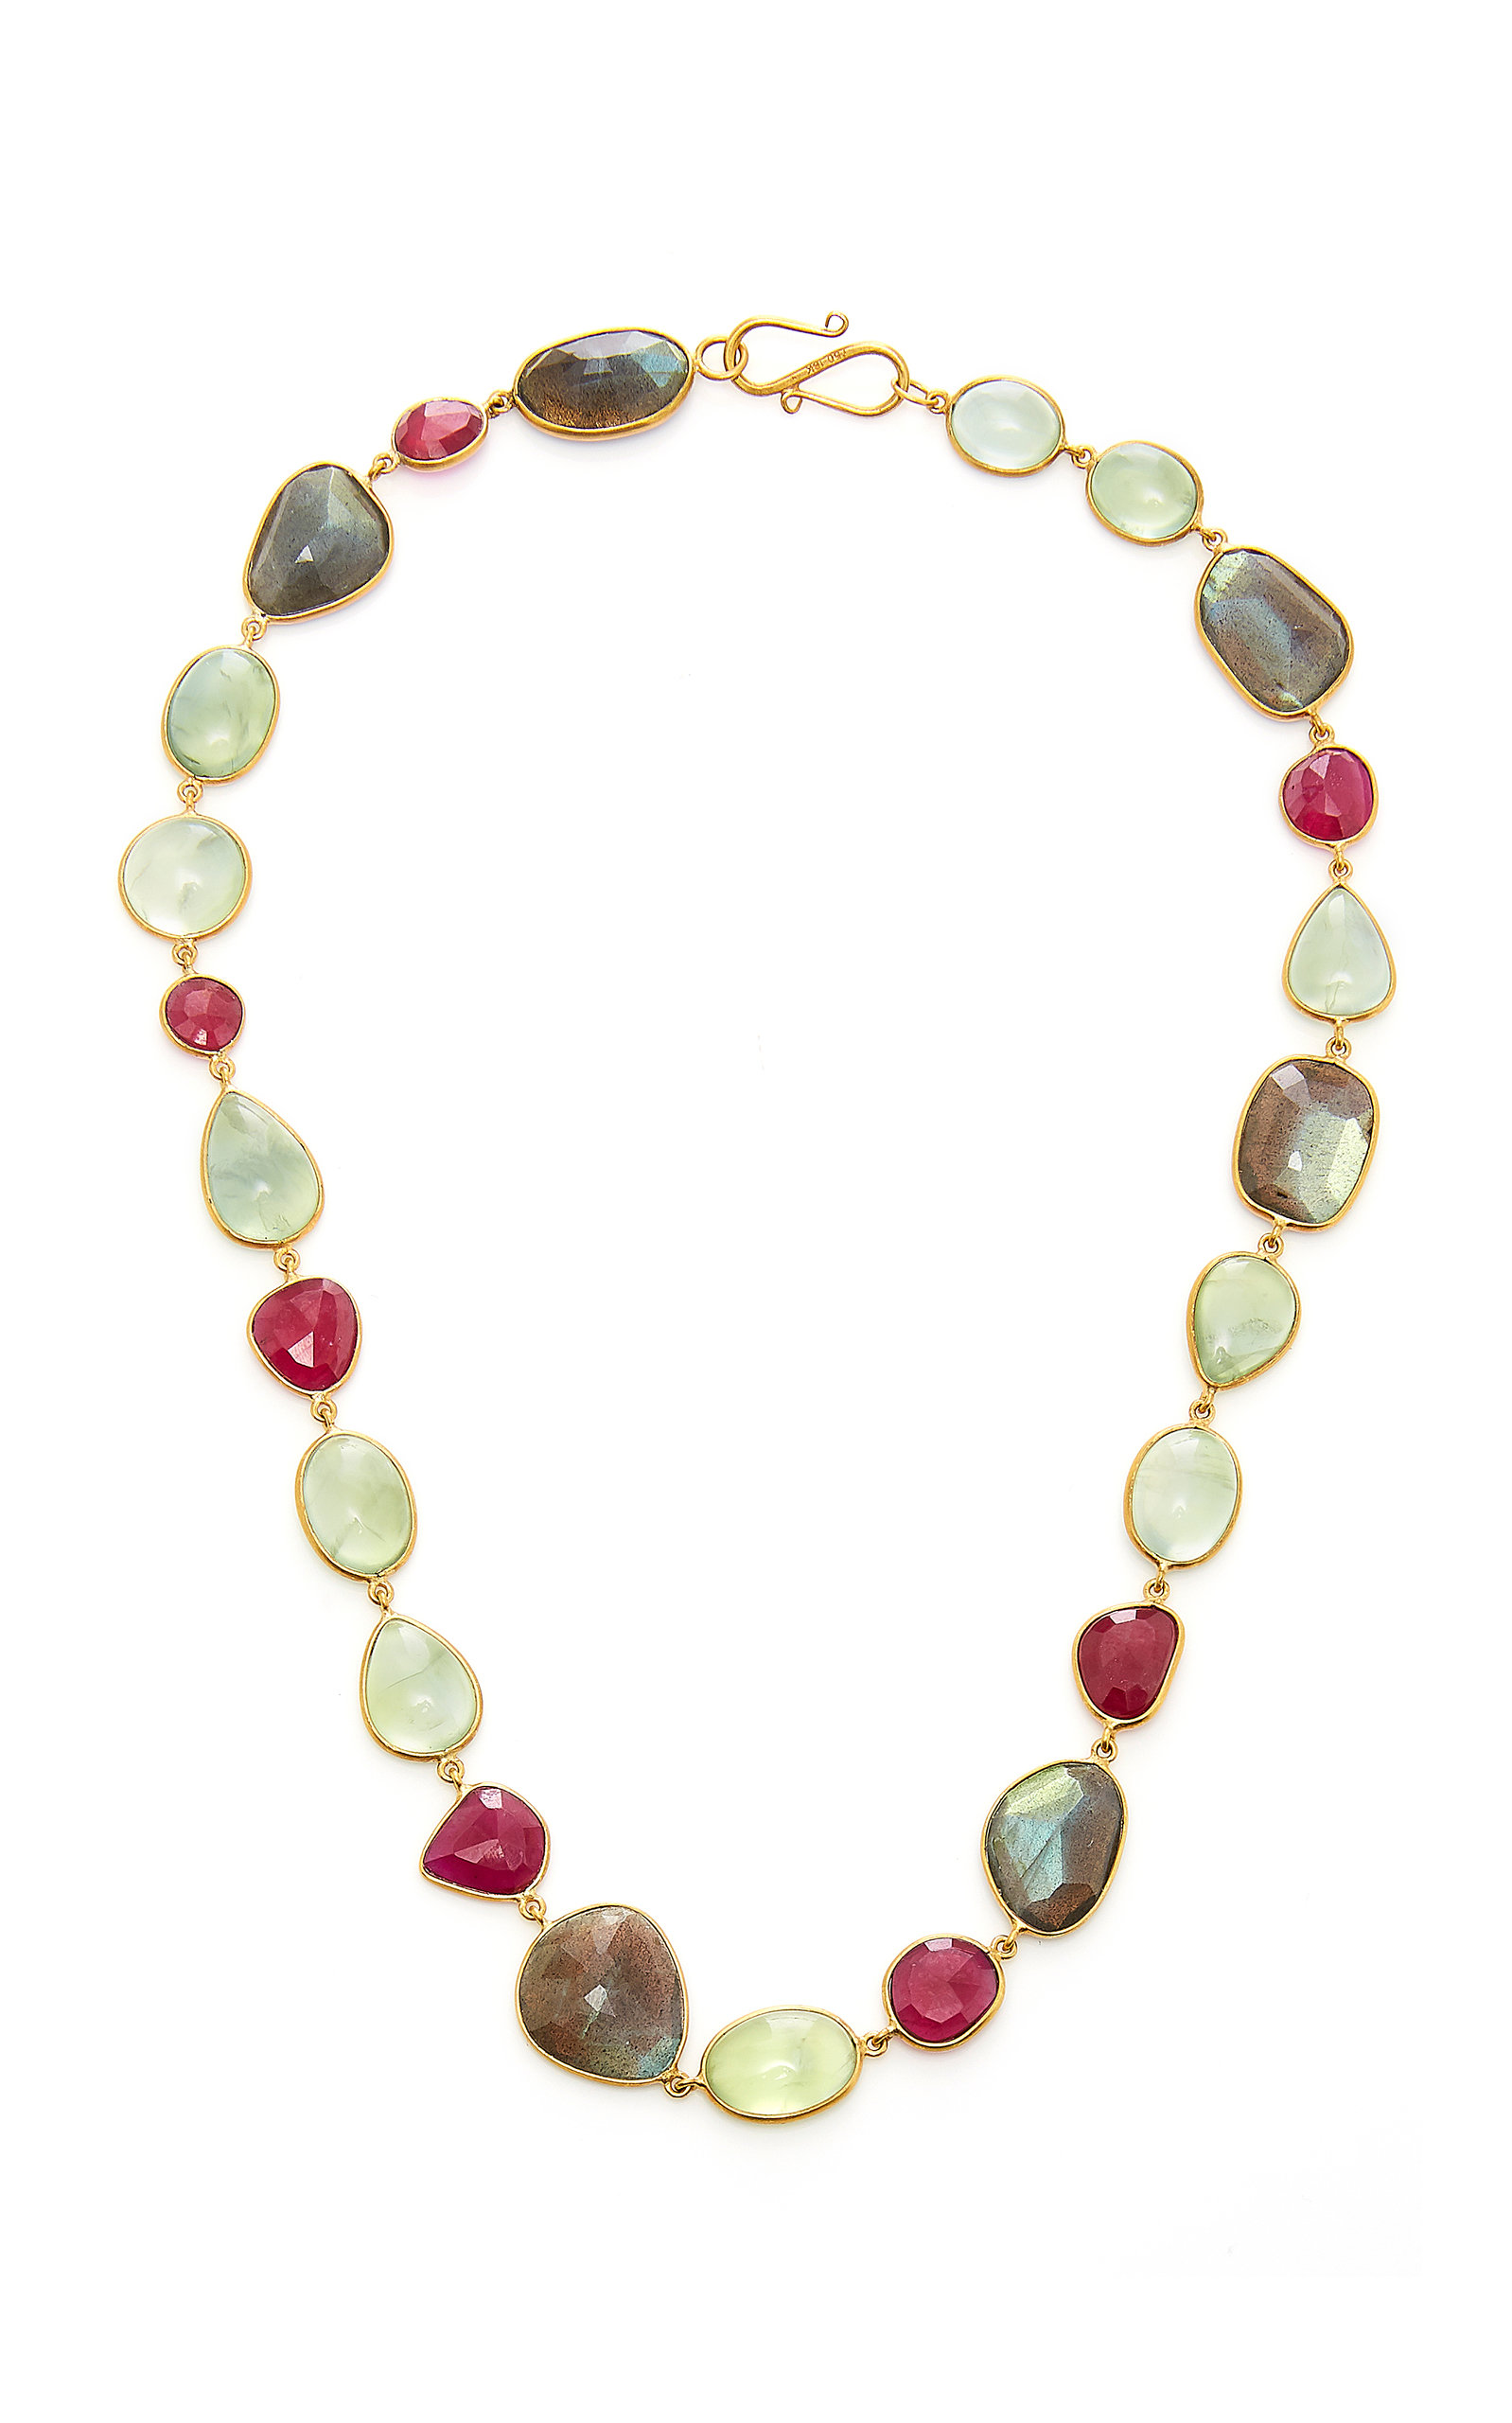 BAHINA 18K Gold Labradorite Praynite And Ruby Necklace in Multi